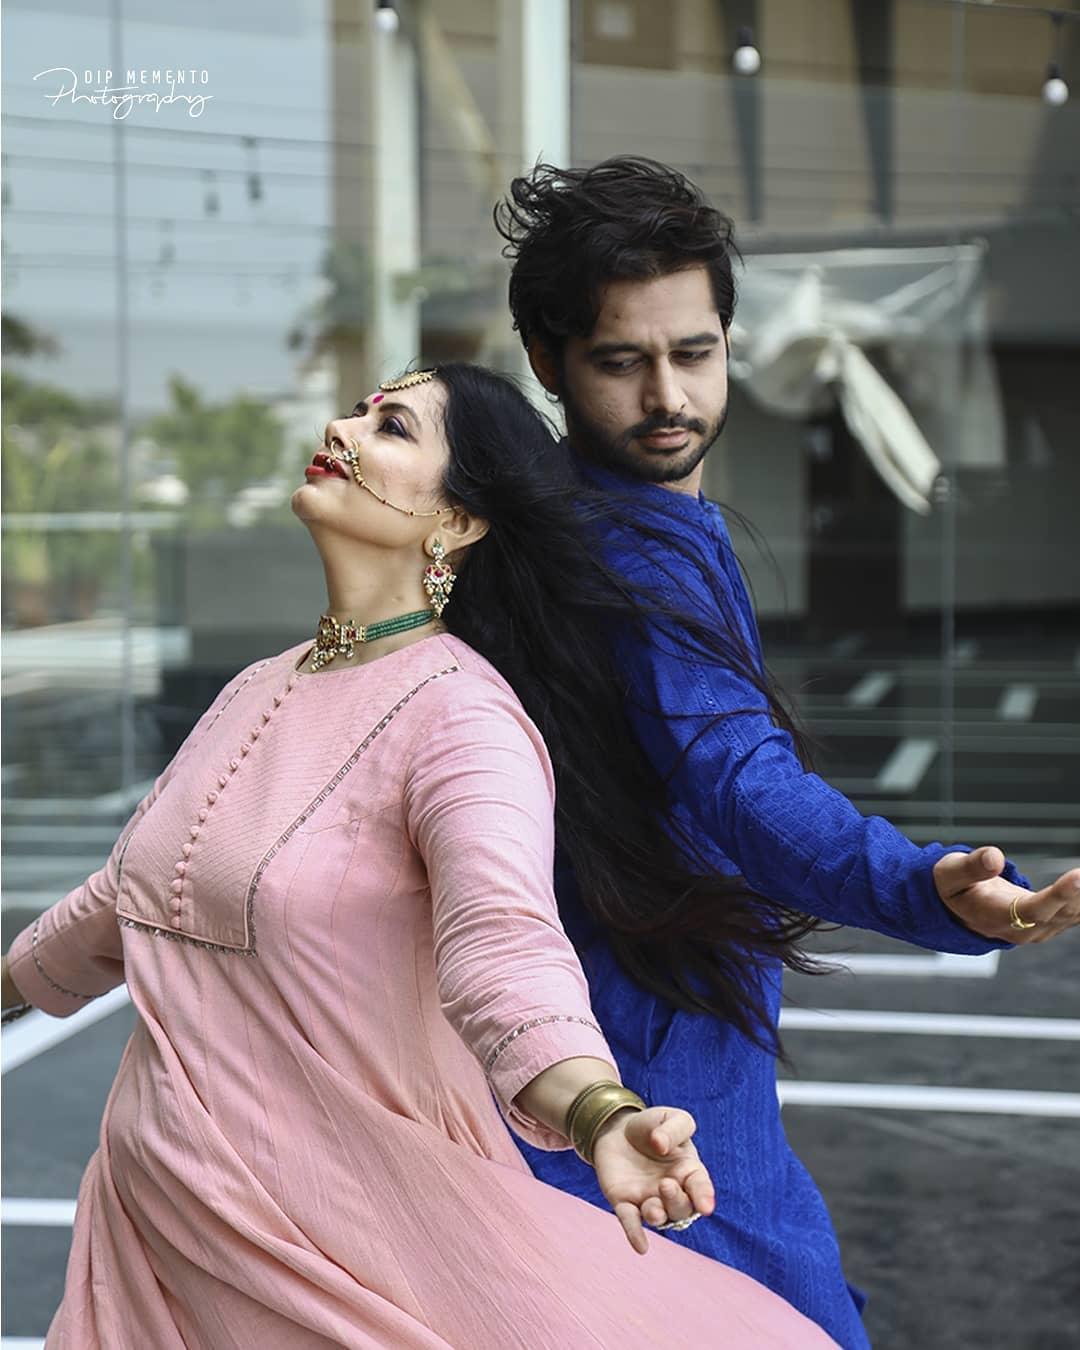 To touch, to move, to inspire. This is true gift of dance.. . . Manmohini Morey Dance video shoot for @nrityalayabyjashodapatel + @evolvedancestudio_ahmedabad InFrame: @jashodapatel_kathak & @parthrajparmar Shoot by :  📷@dip_memento_photography . . . . #kathak #bollykathak #contempkathak  #classicalchoreography #classicaldance #indiandancefederation #dancephotographer #indiandancerscommunity  #kathak_space #9924227745 #kathaklovers #danceoftalent #kathakdancers  #kathakfusion #dipmementophotography #dancevideo #dancers #dancelovers #dancersofinstagram #photography #videography